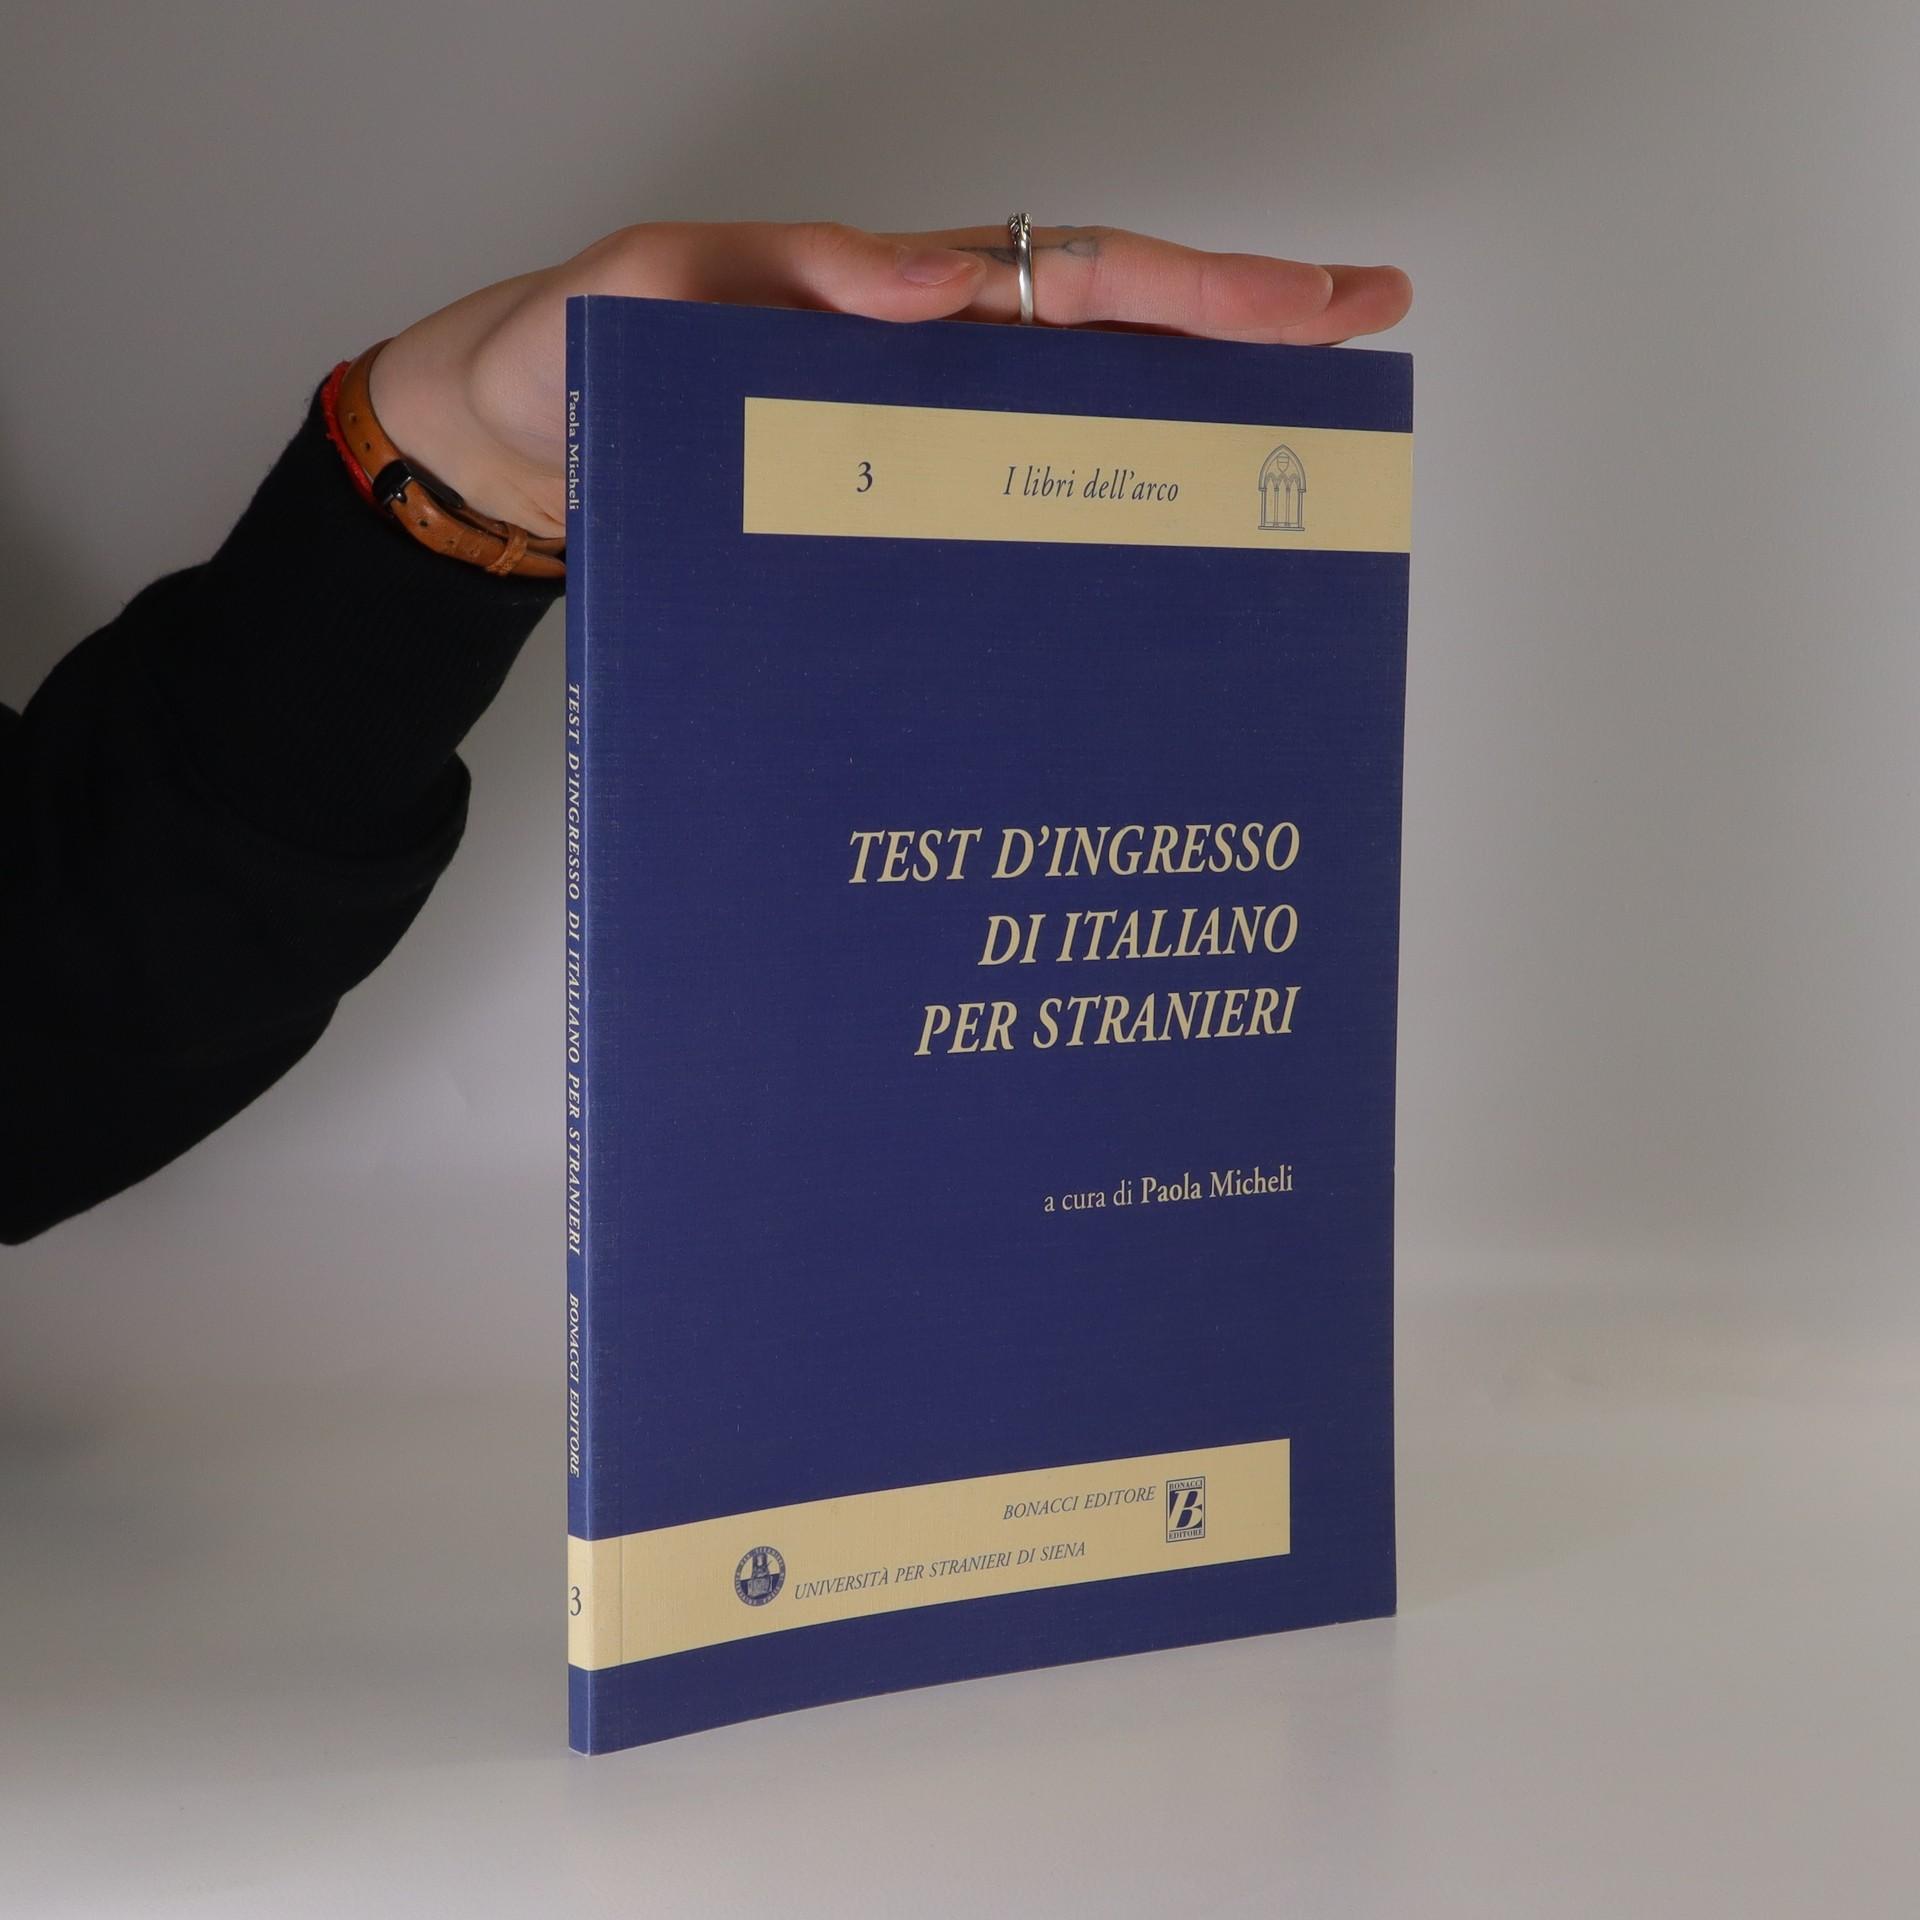 antikvární kniha Test d'ingresso di italiano per stranieri, 1994